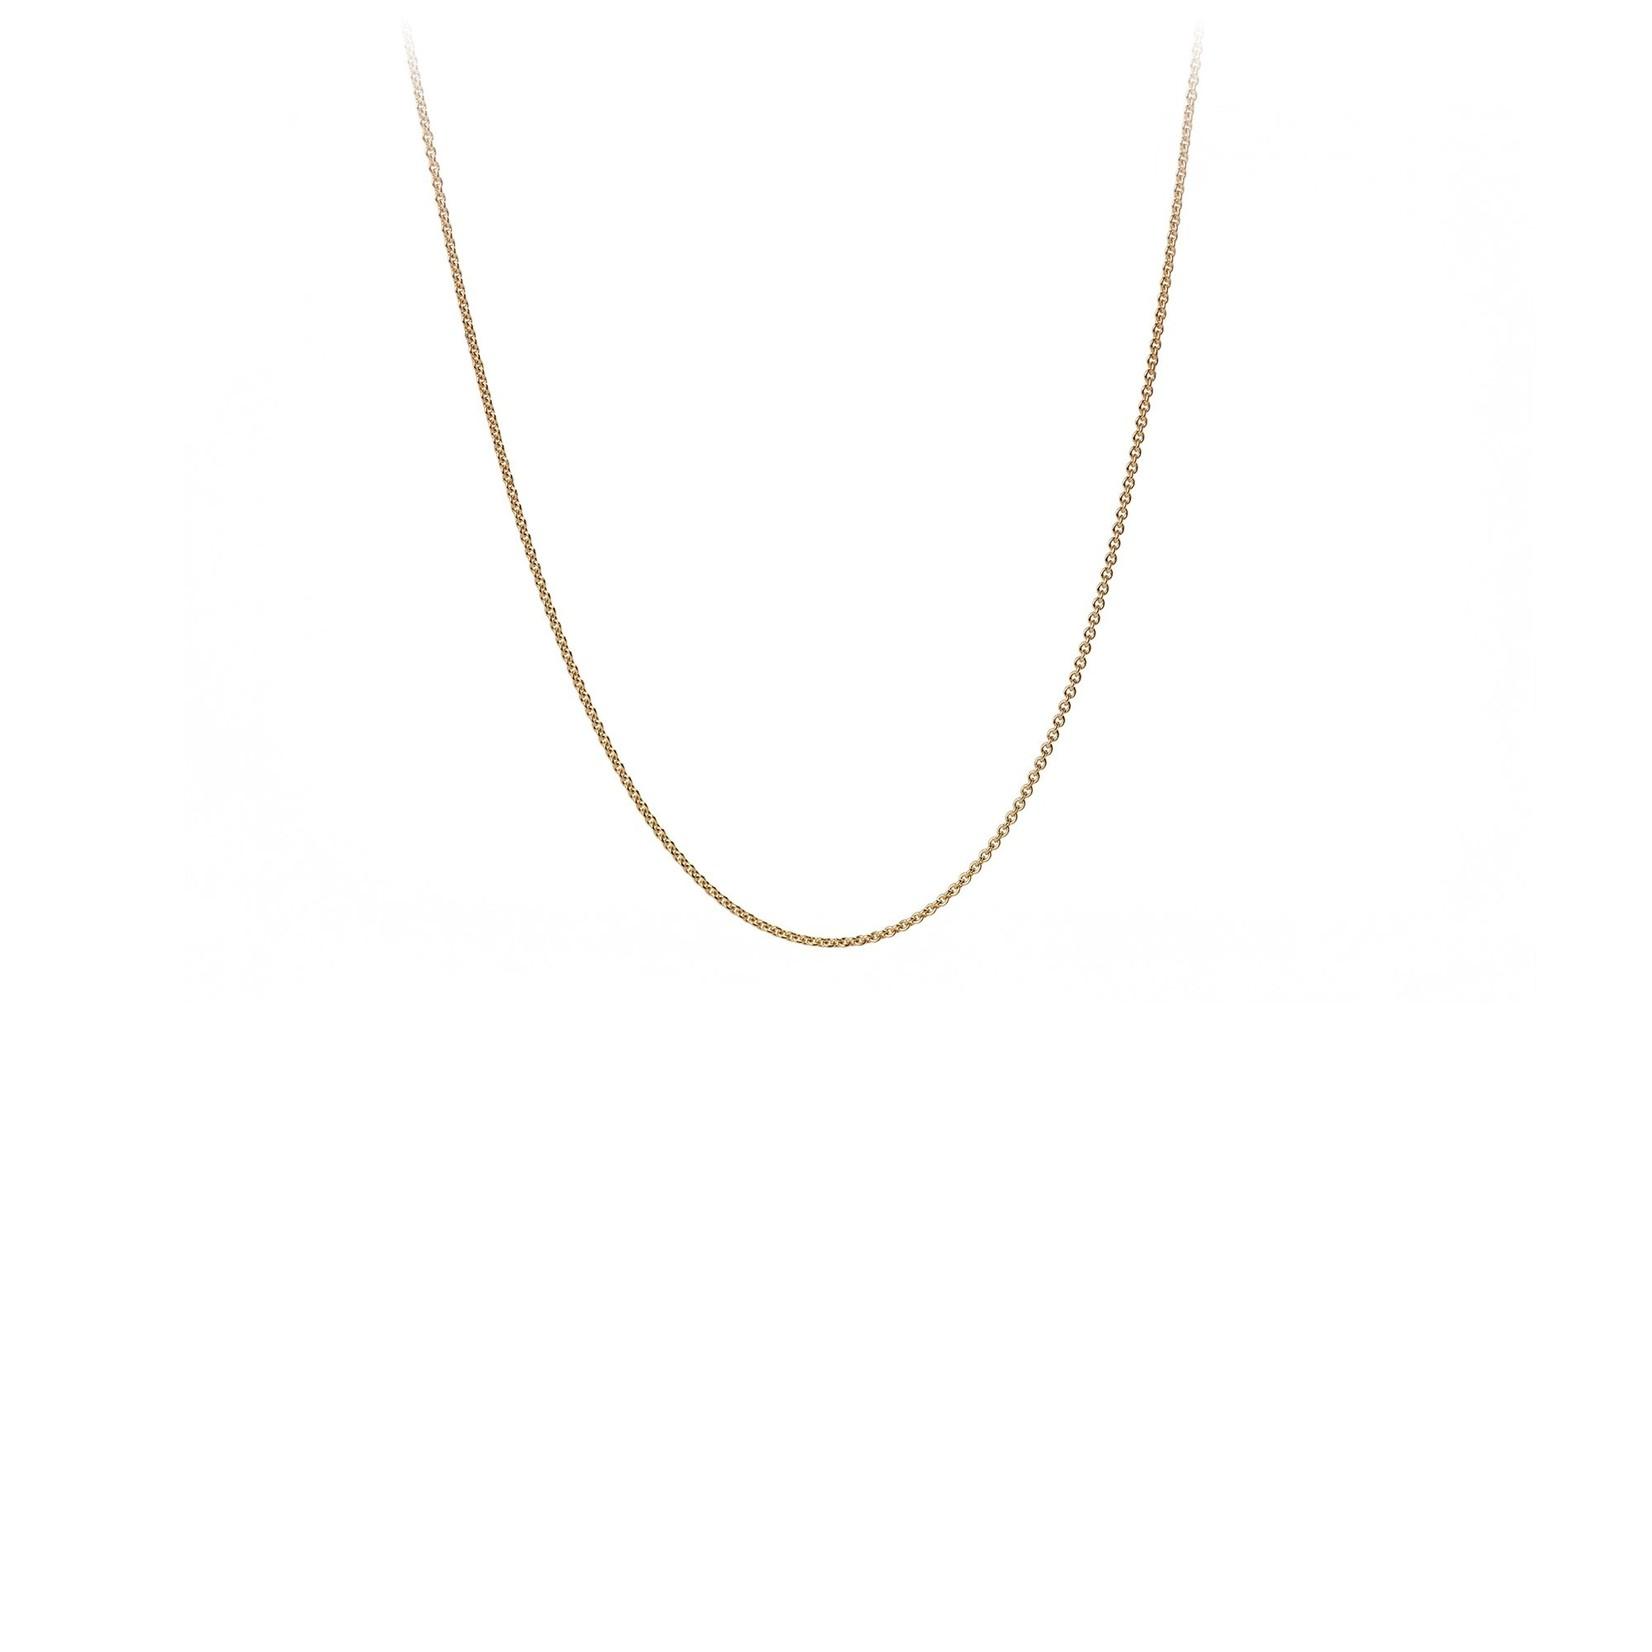 Pyrrha 14K Gold Fine Cable Chain